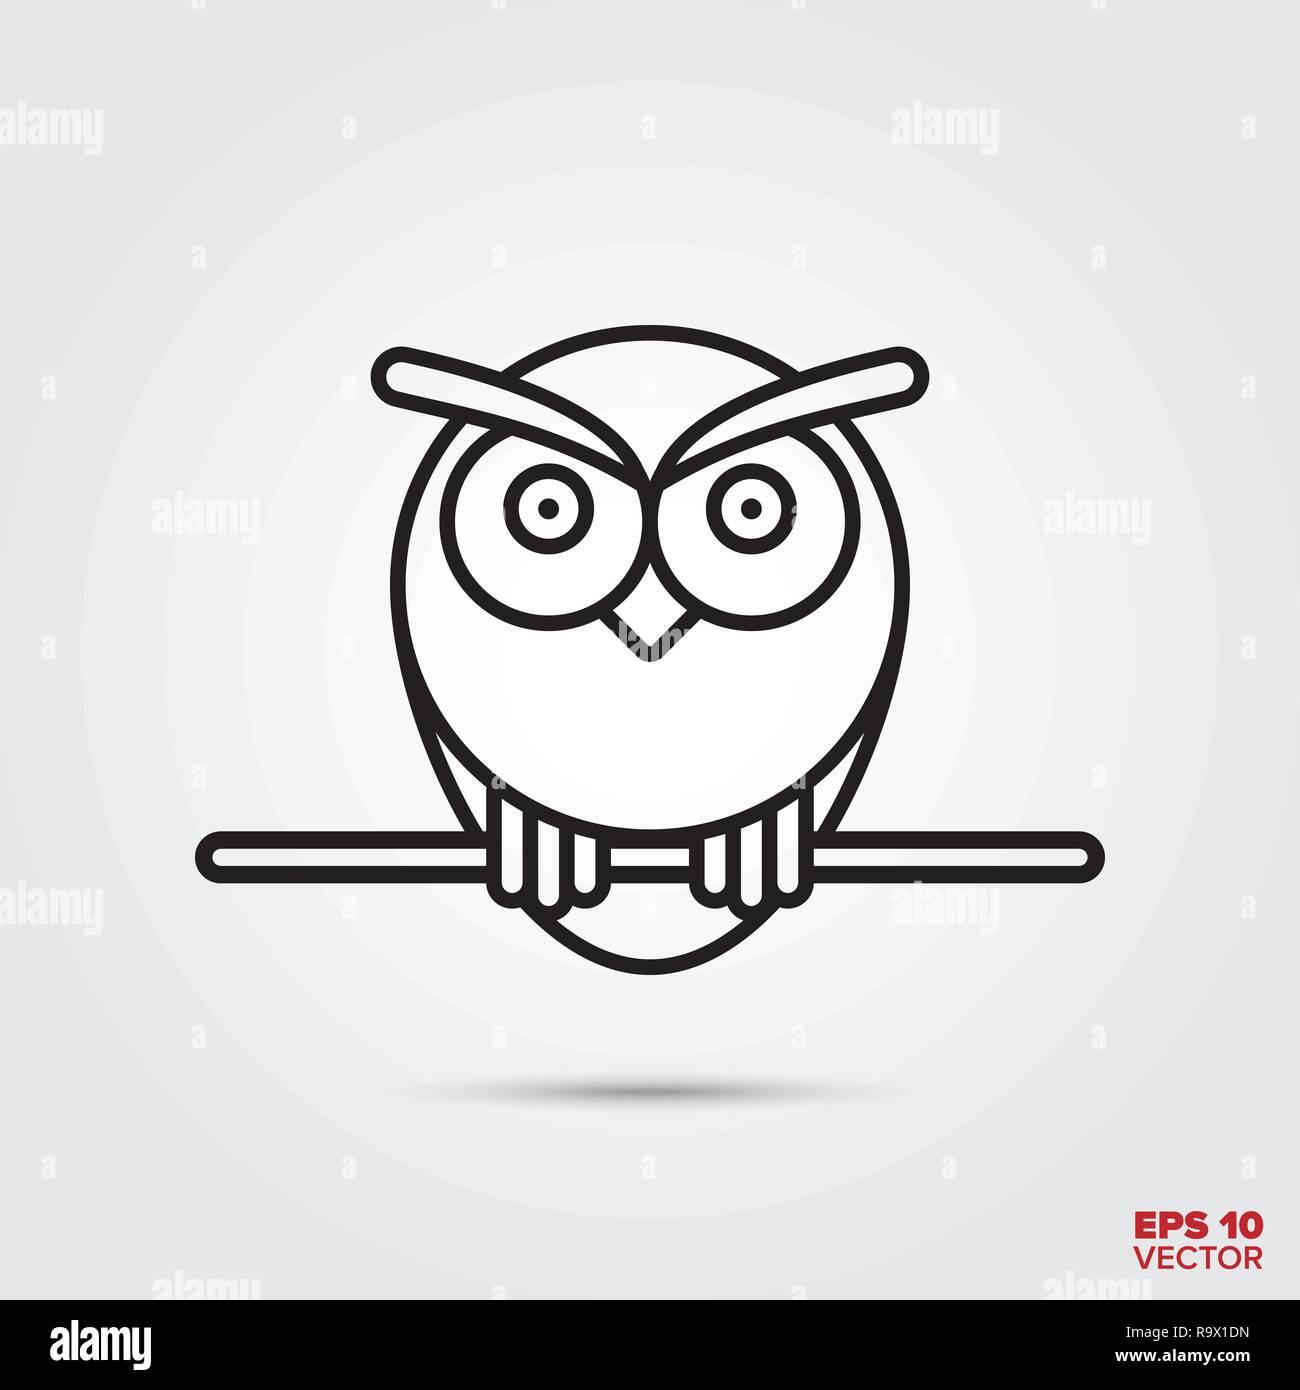 Owl line icon vector illustration. Knowledge and wisdom symbol. - Stock Vector